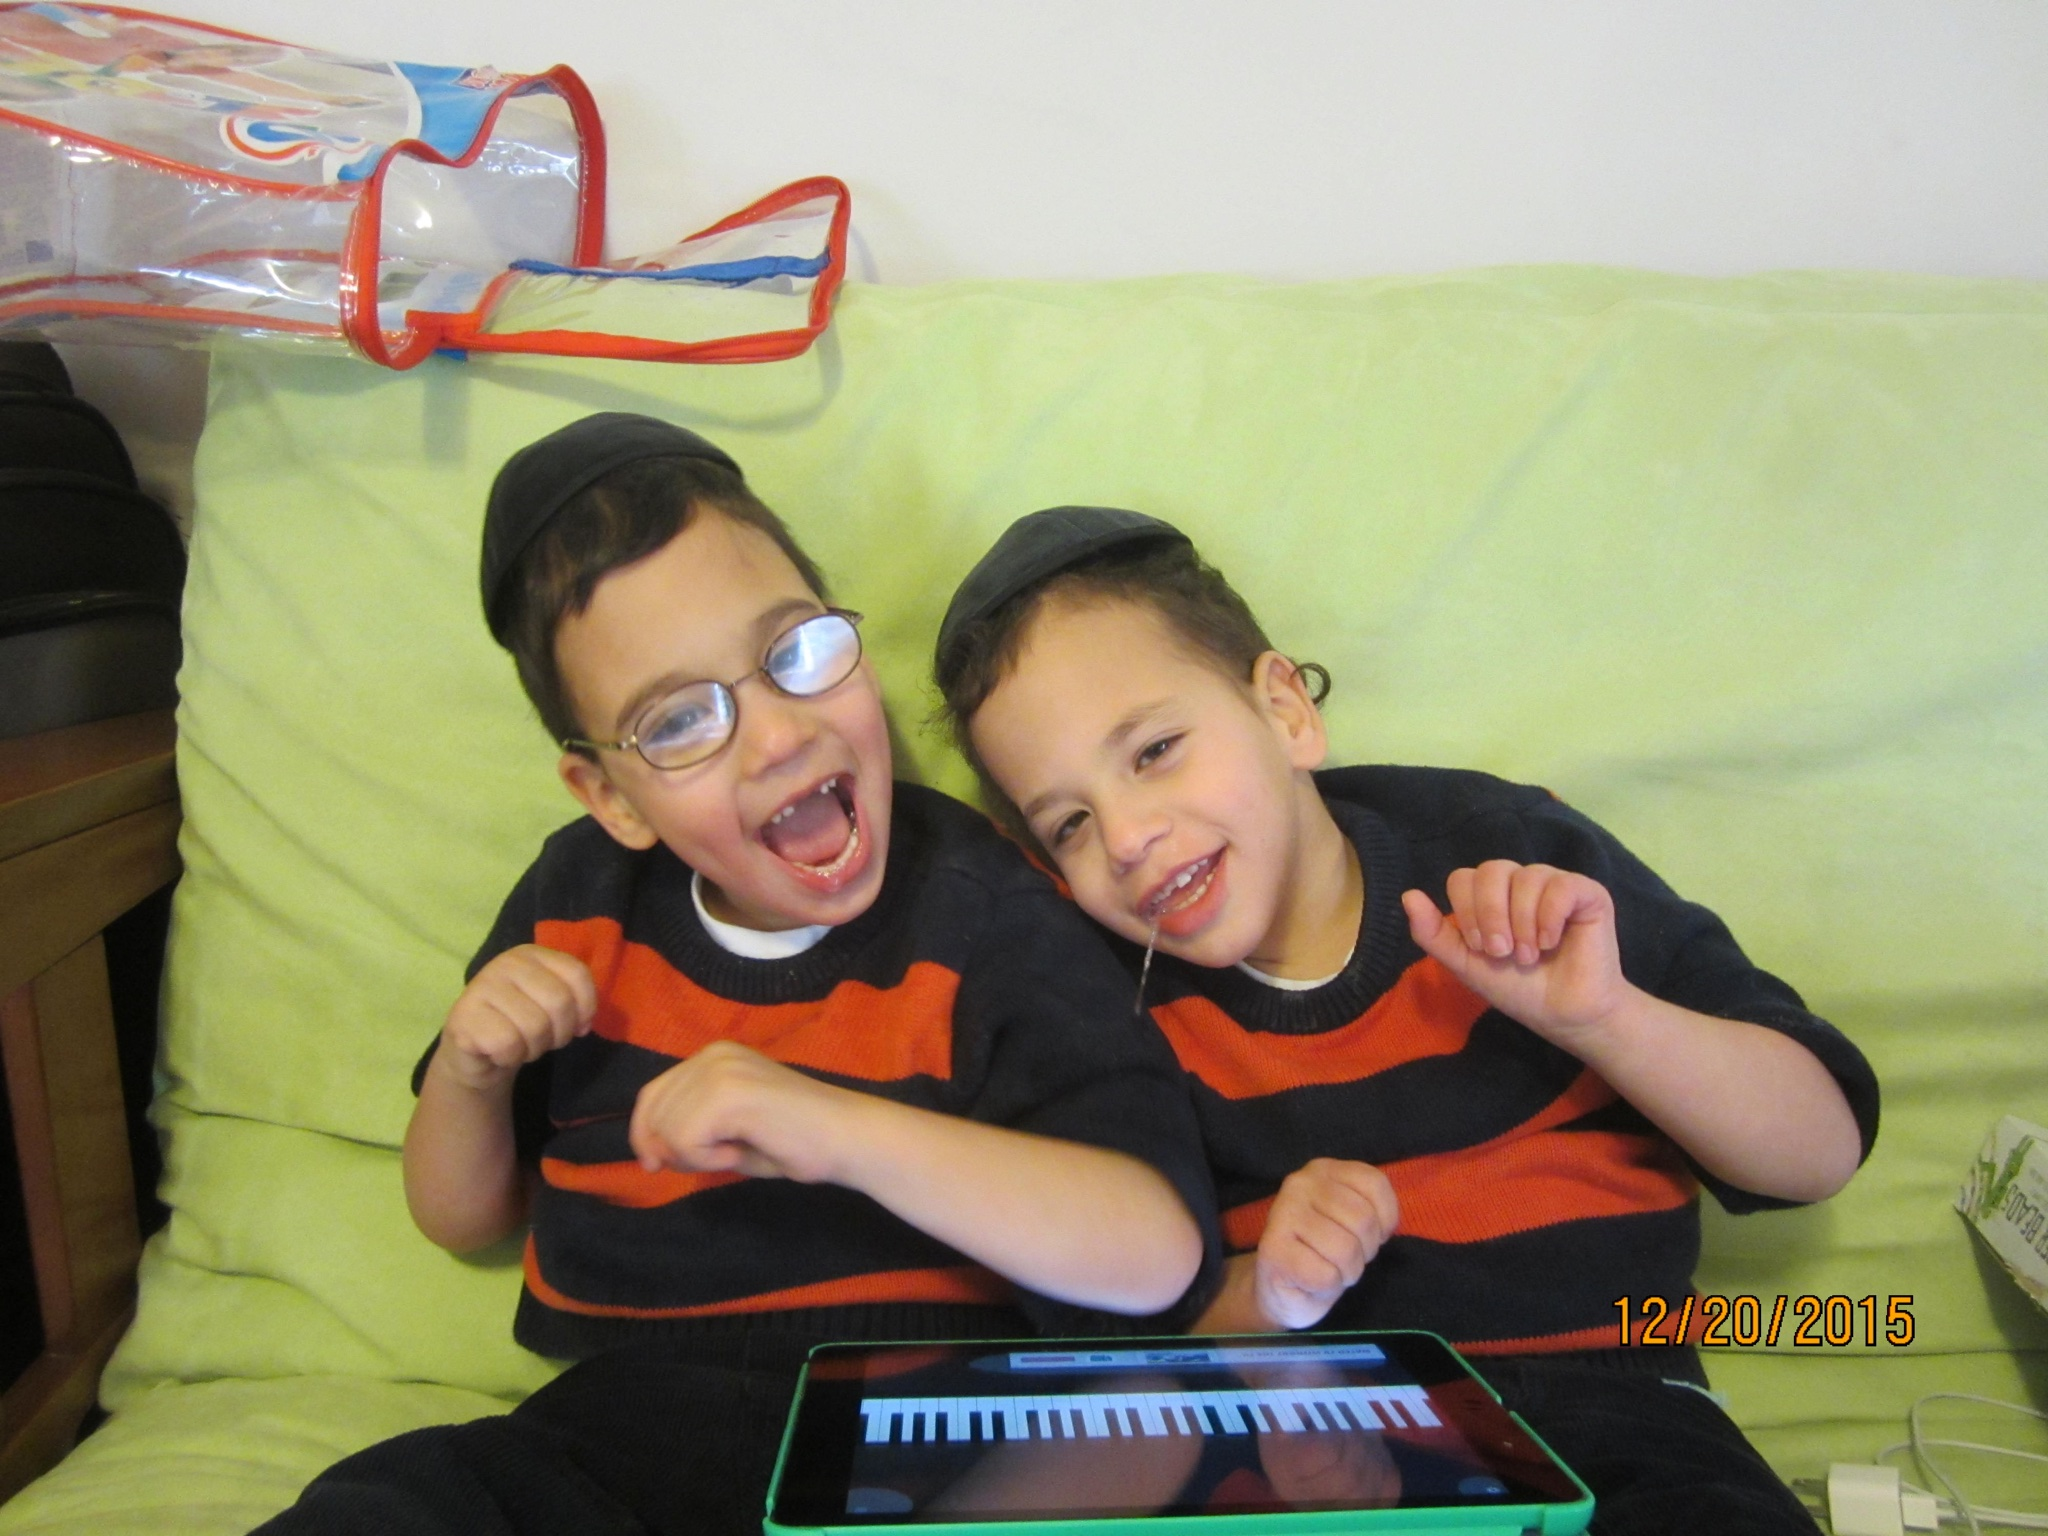 Kiddush Hashem: Jews Unite to Modify the Home of Eli and Nachy Ribakow